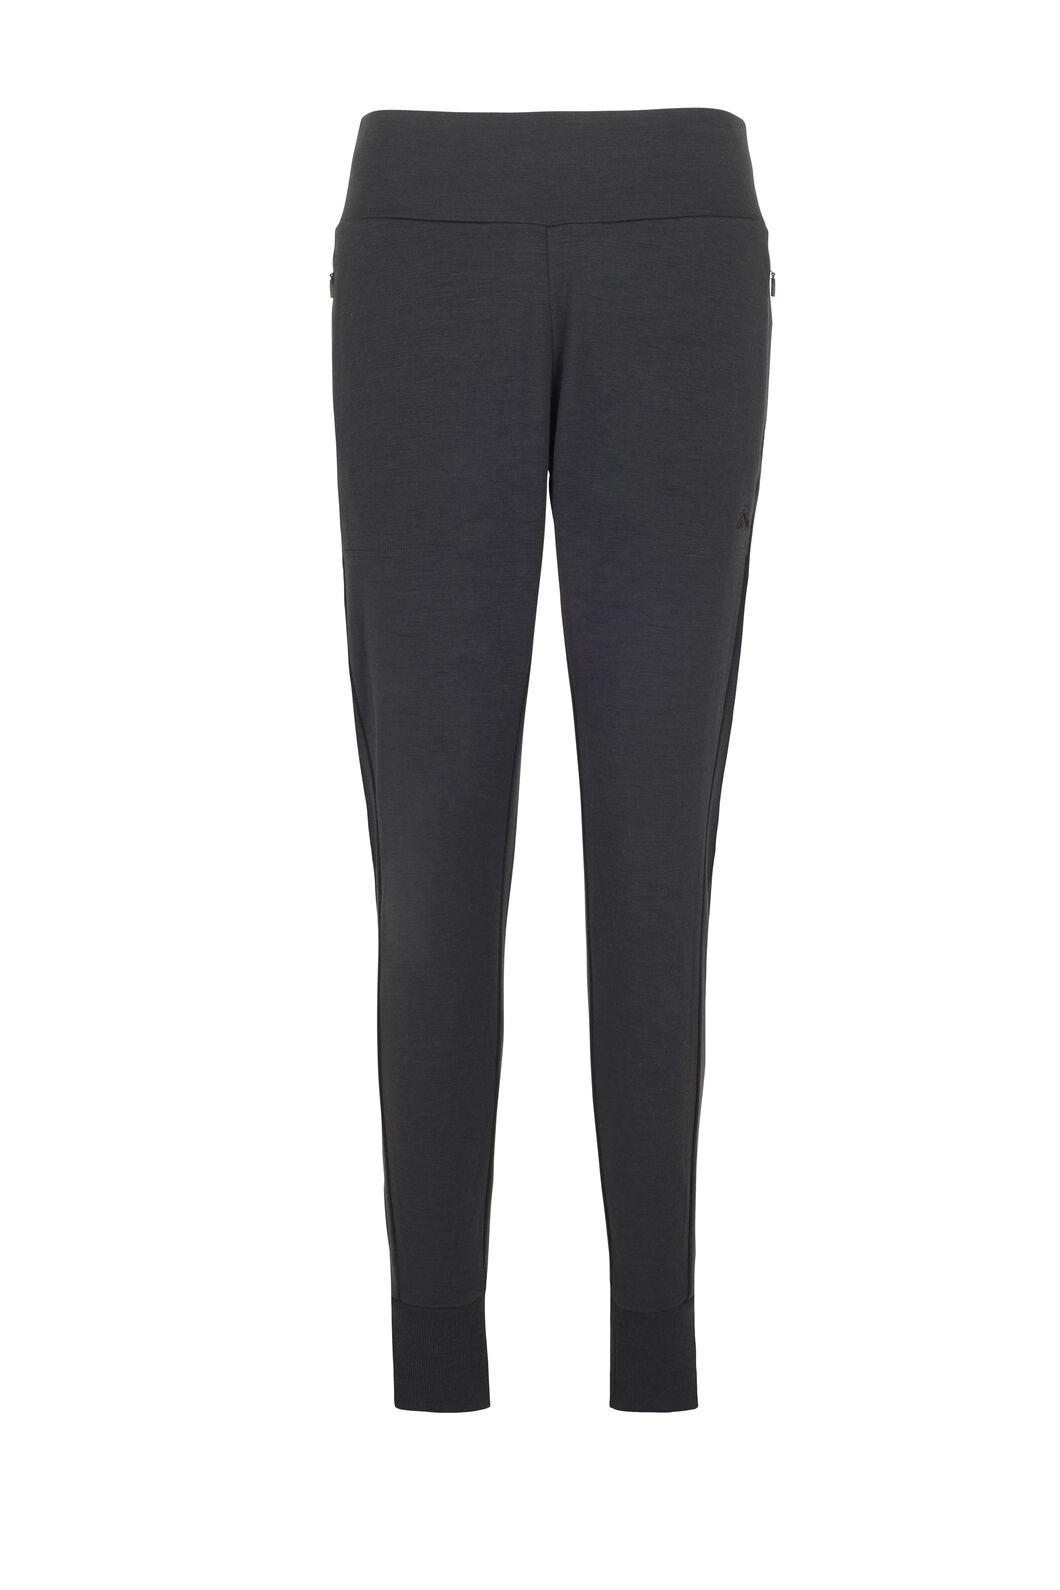 Macpac Merino Blend Track Pants — Women's, Black, hi-res